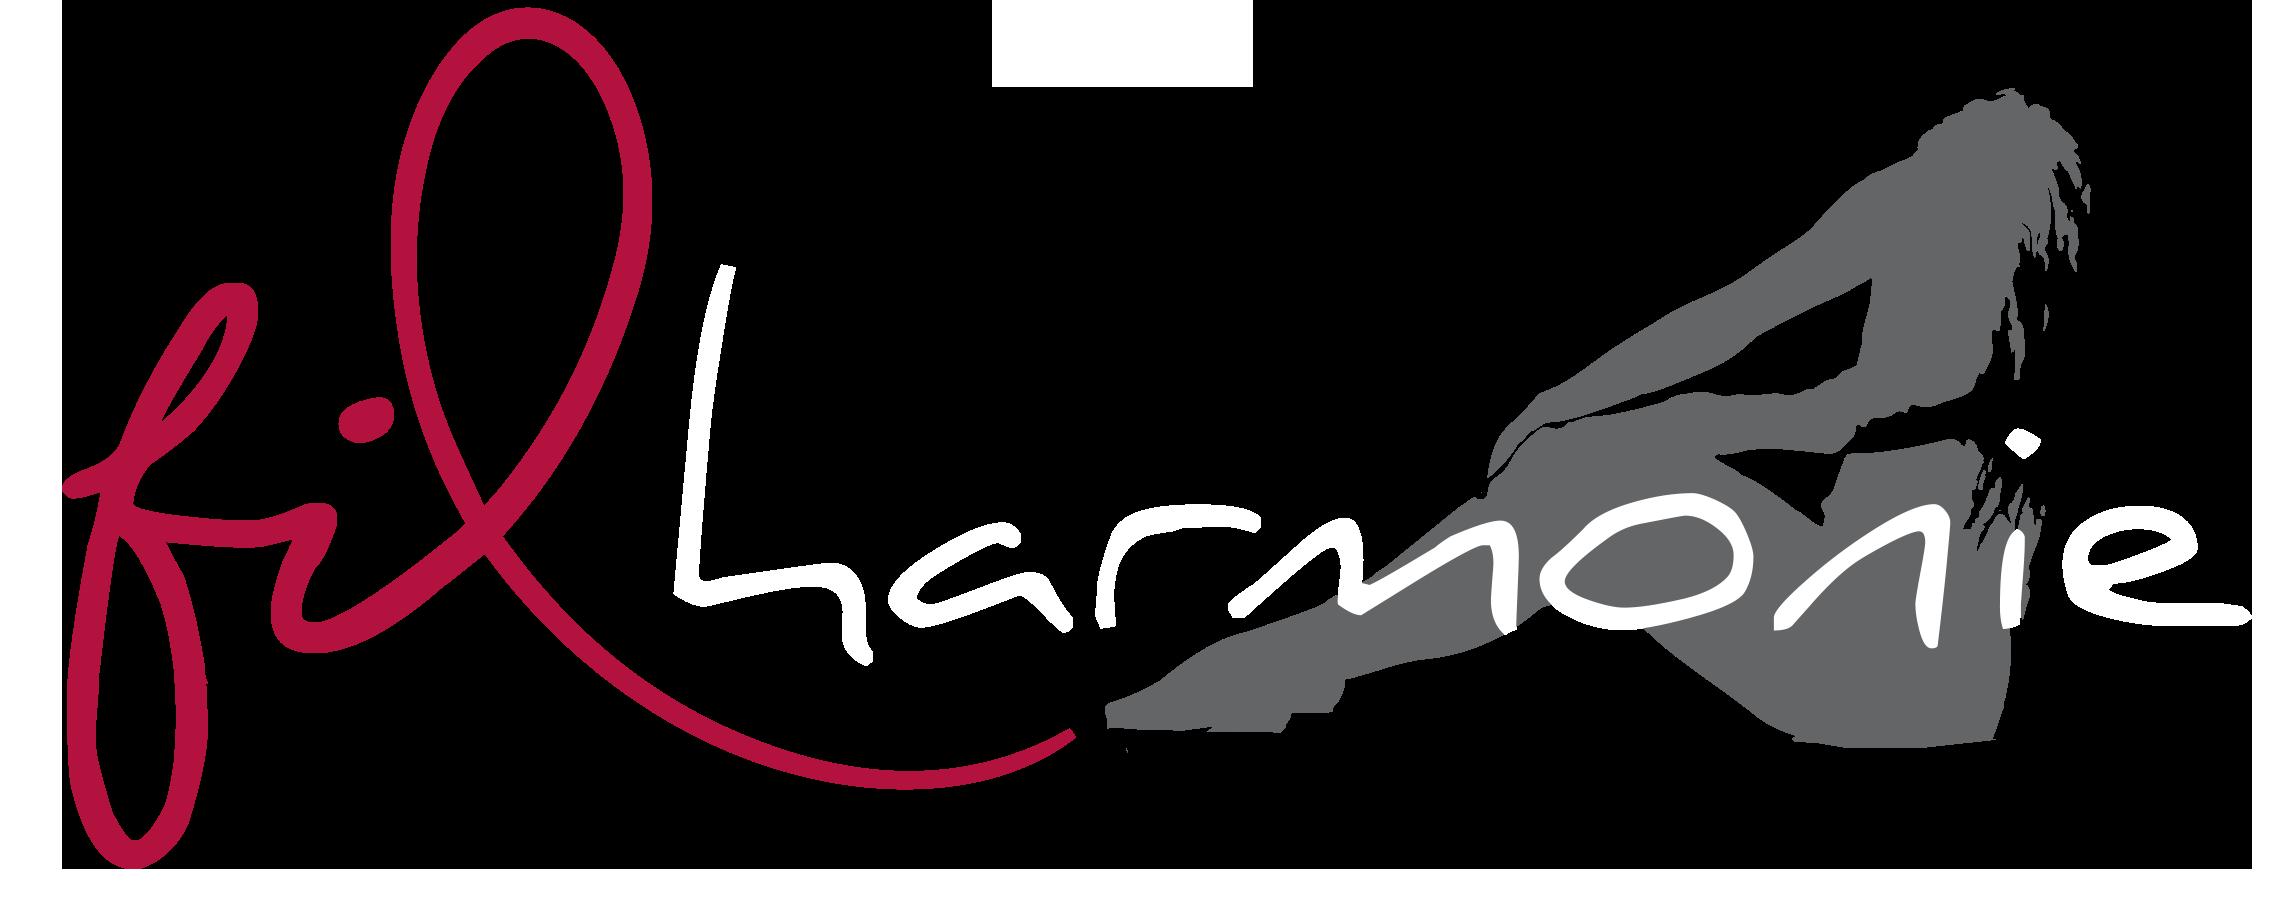 Fil'harmonie